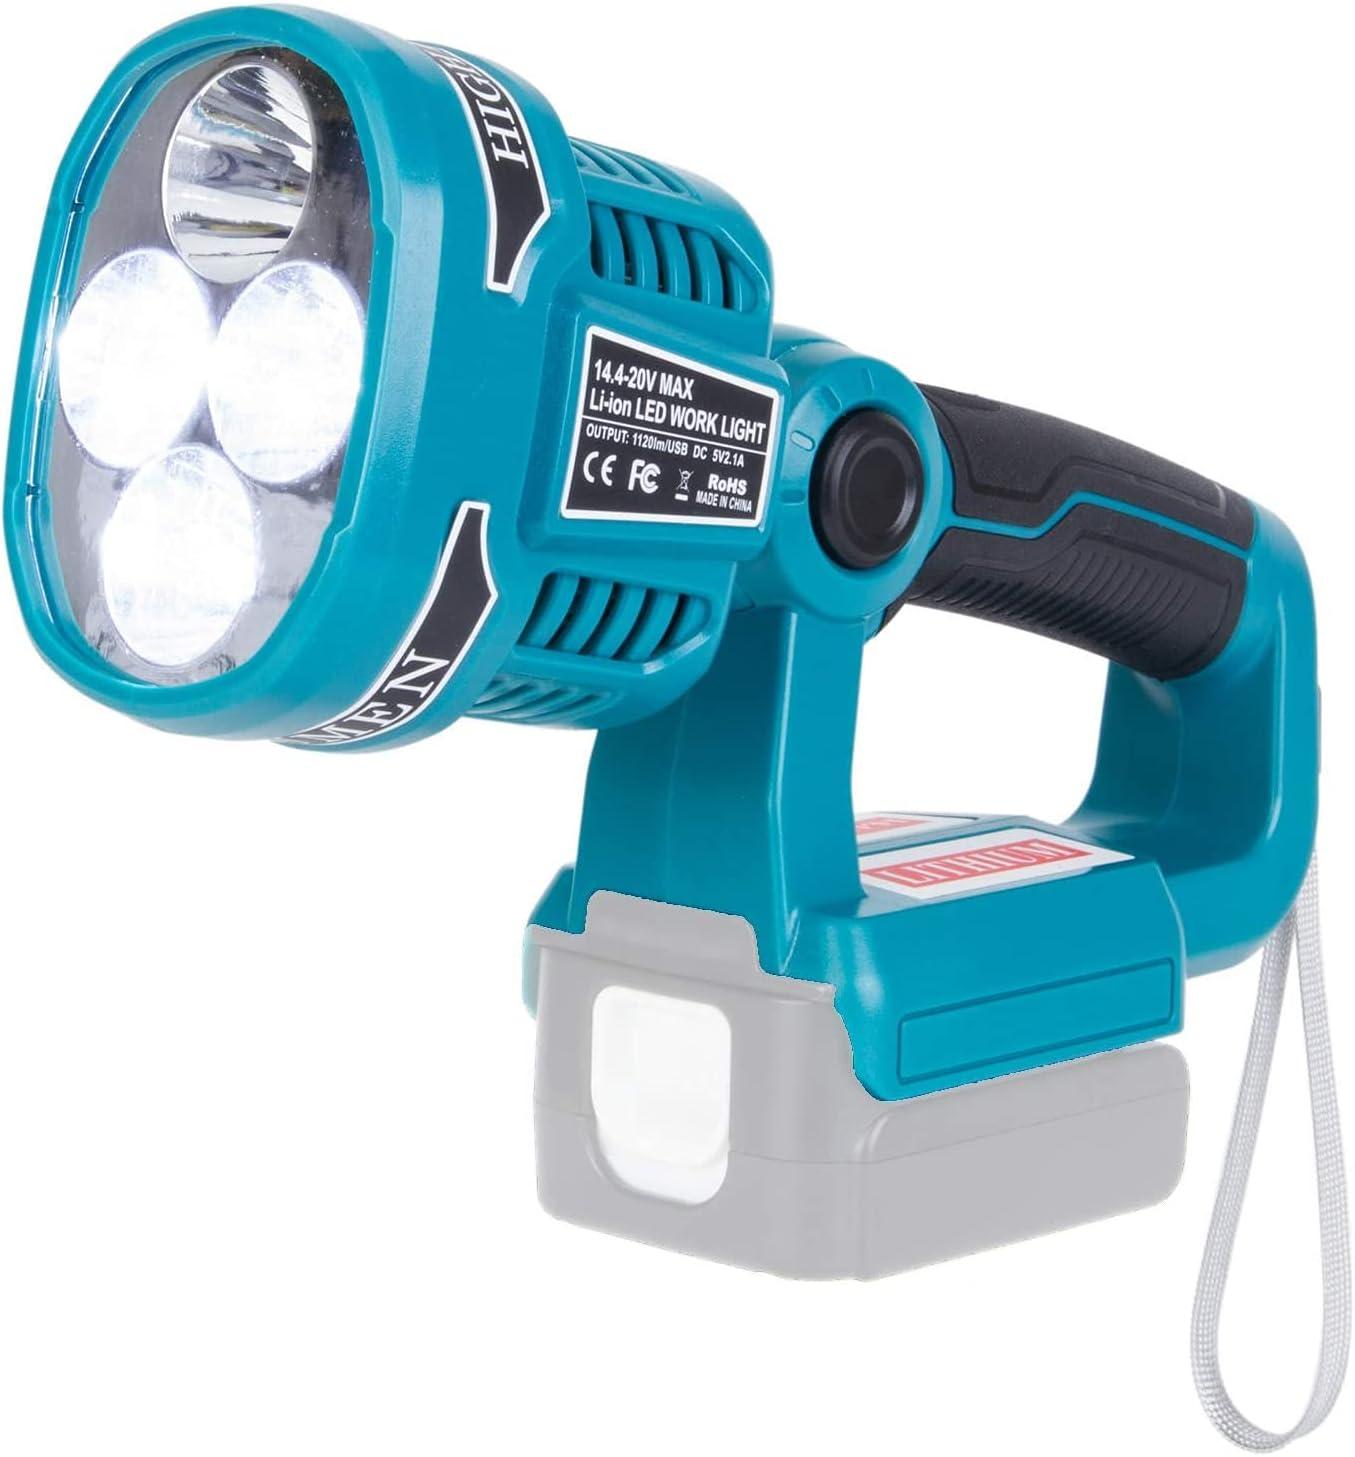 For Makita LED light BL1860 Light S outdoor Flashlight Work Cheap Max 52% OFF sale